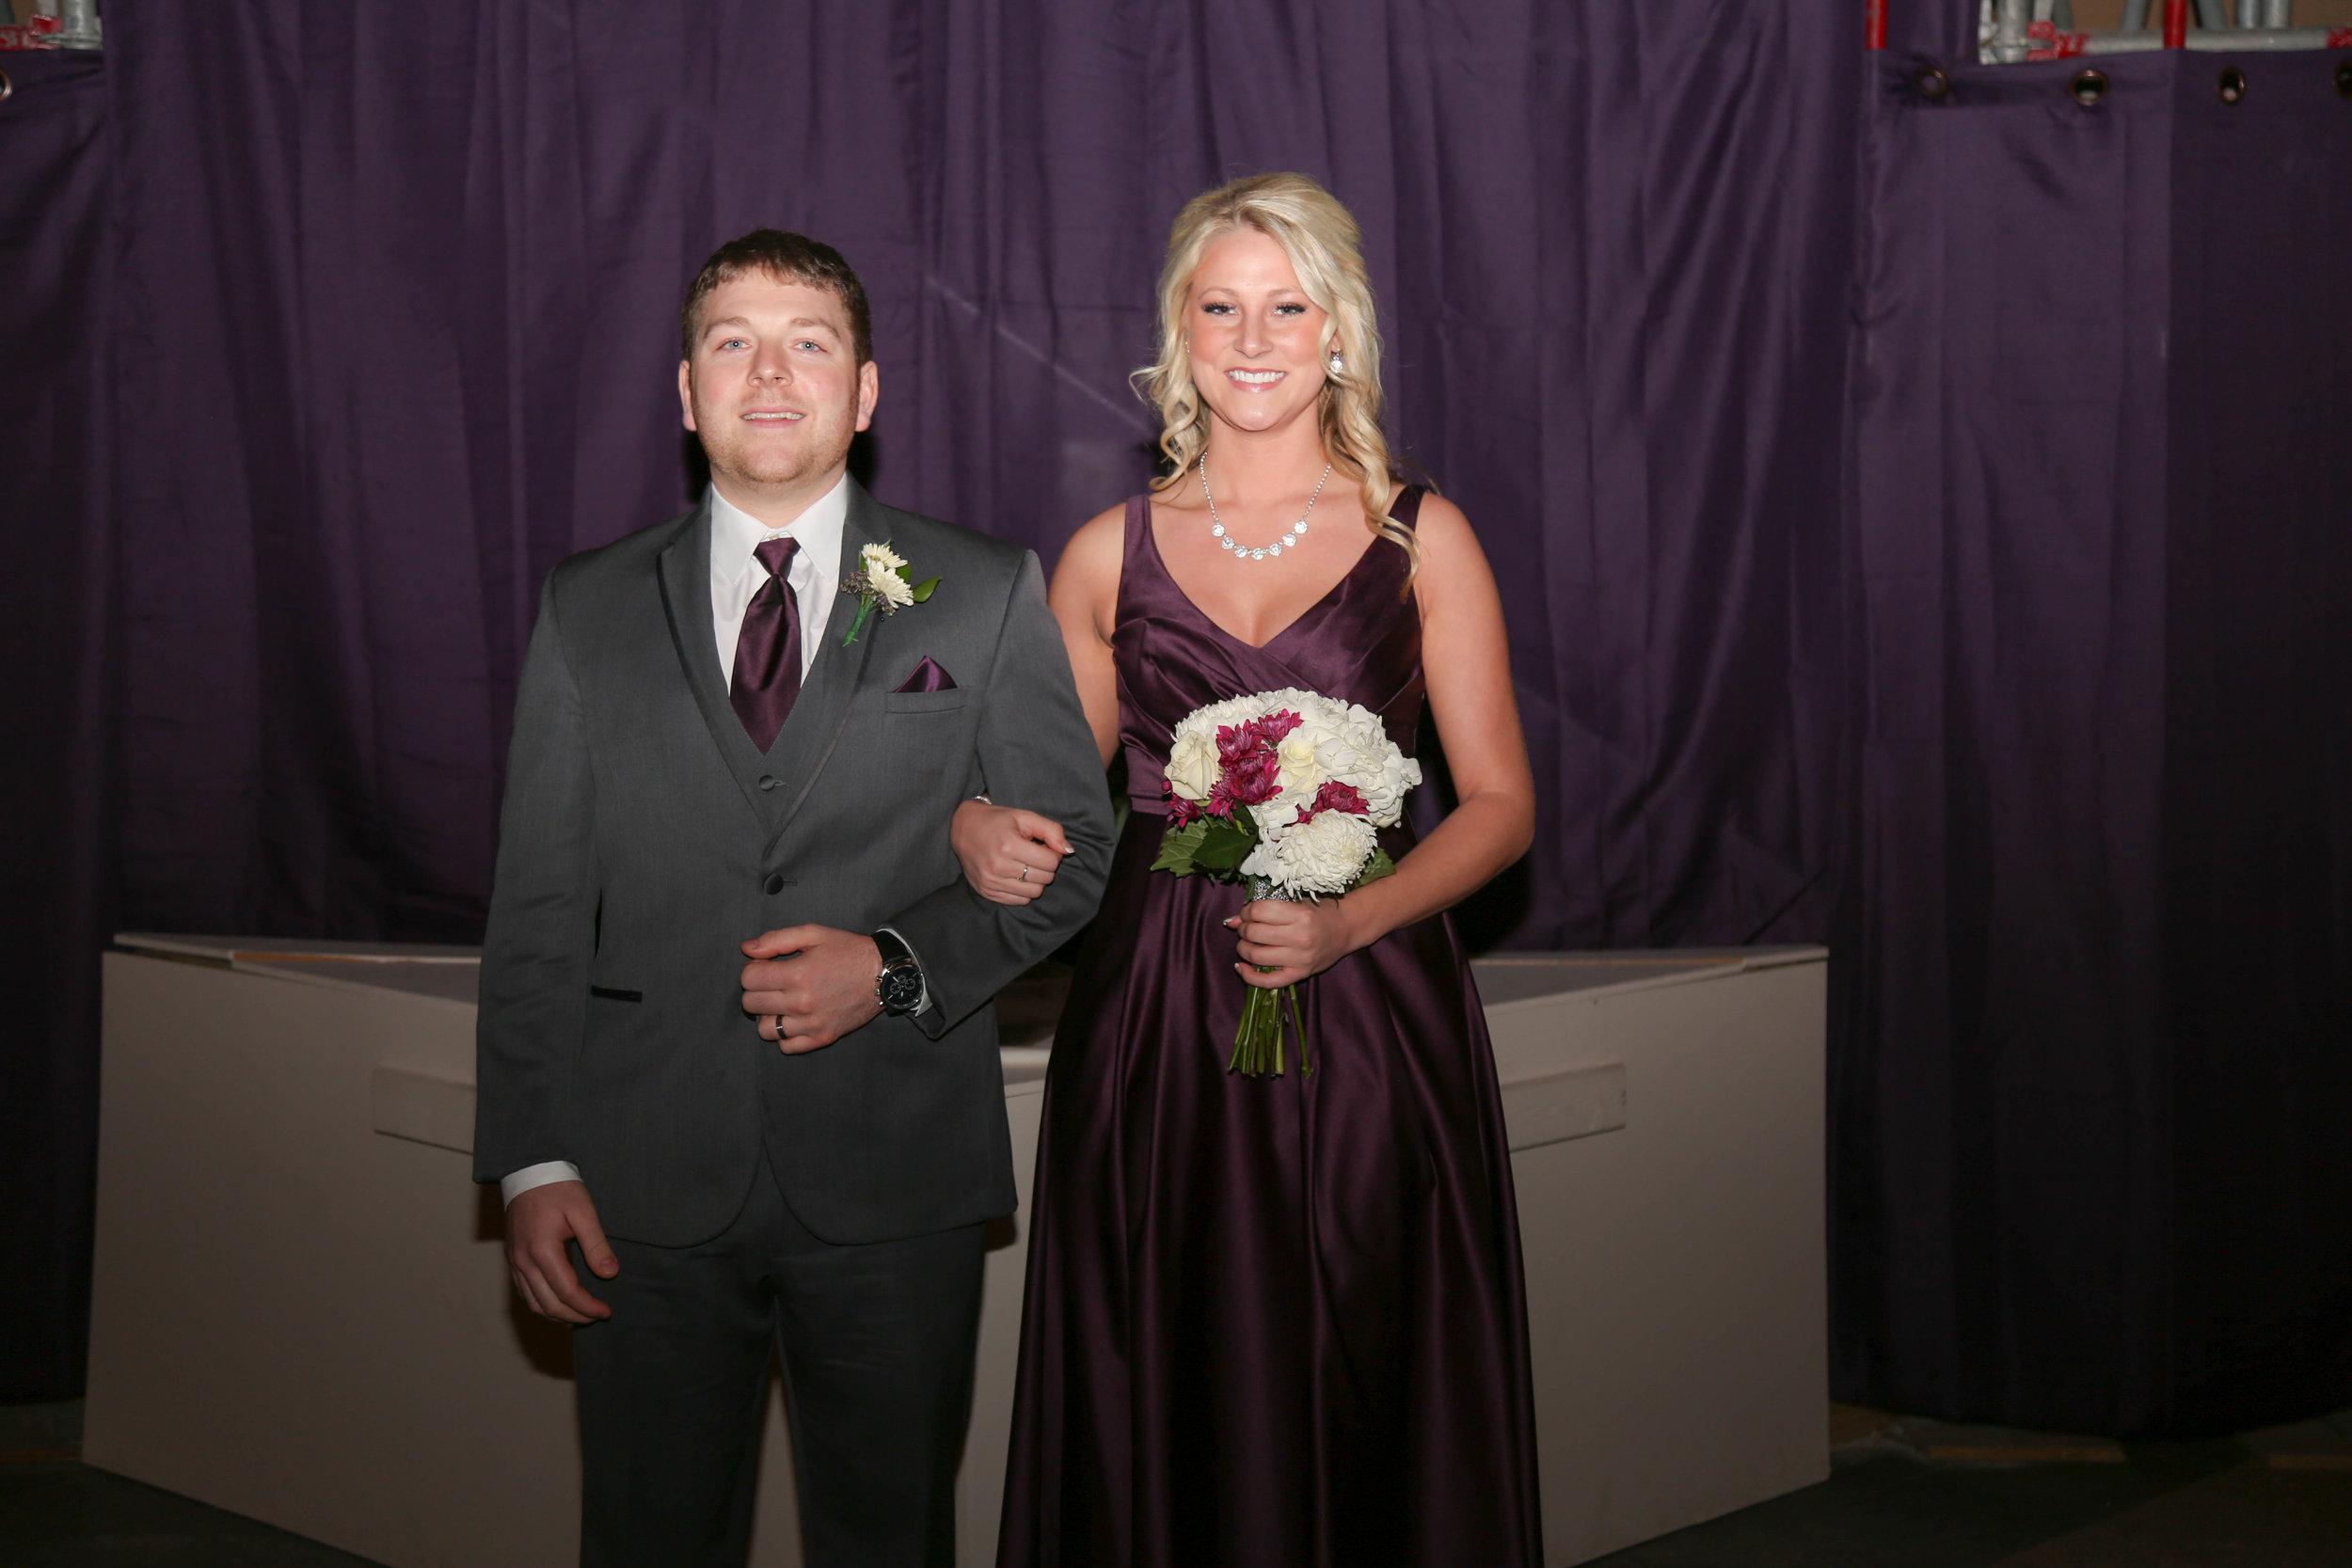 Jason and Lindsey's Wedding-256.jpg